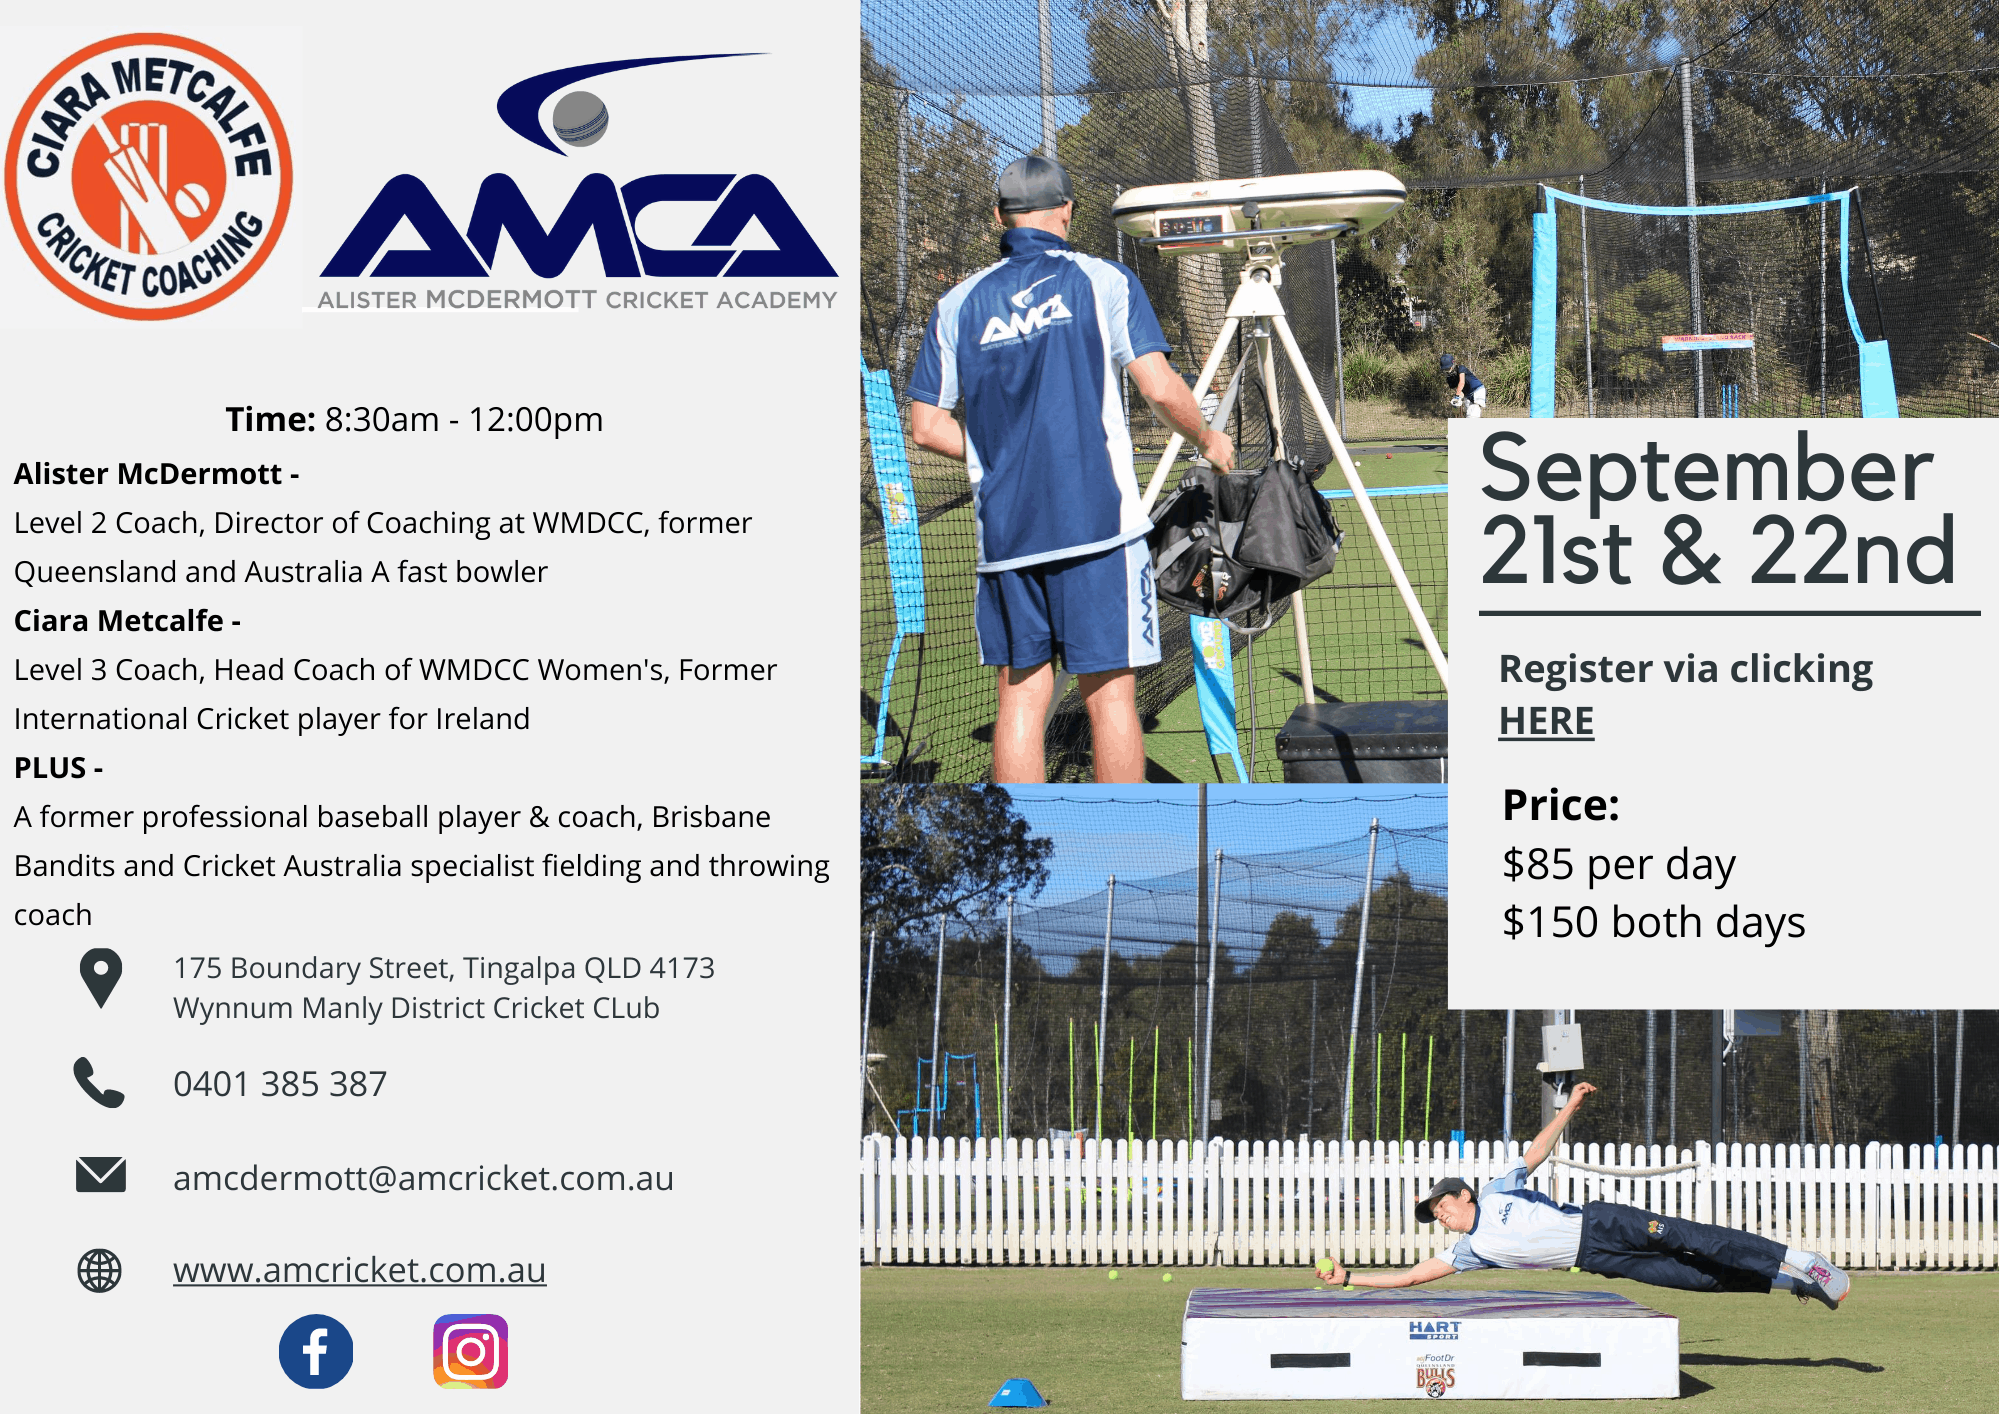 AMCA Cricket Camp September